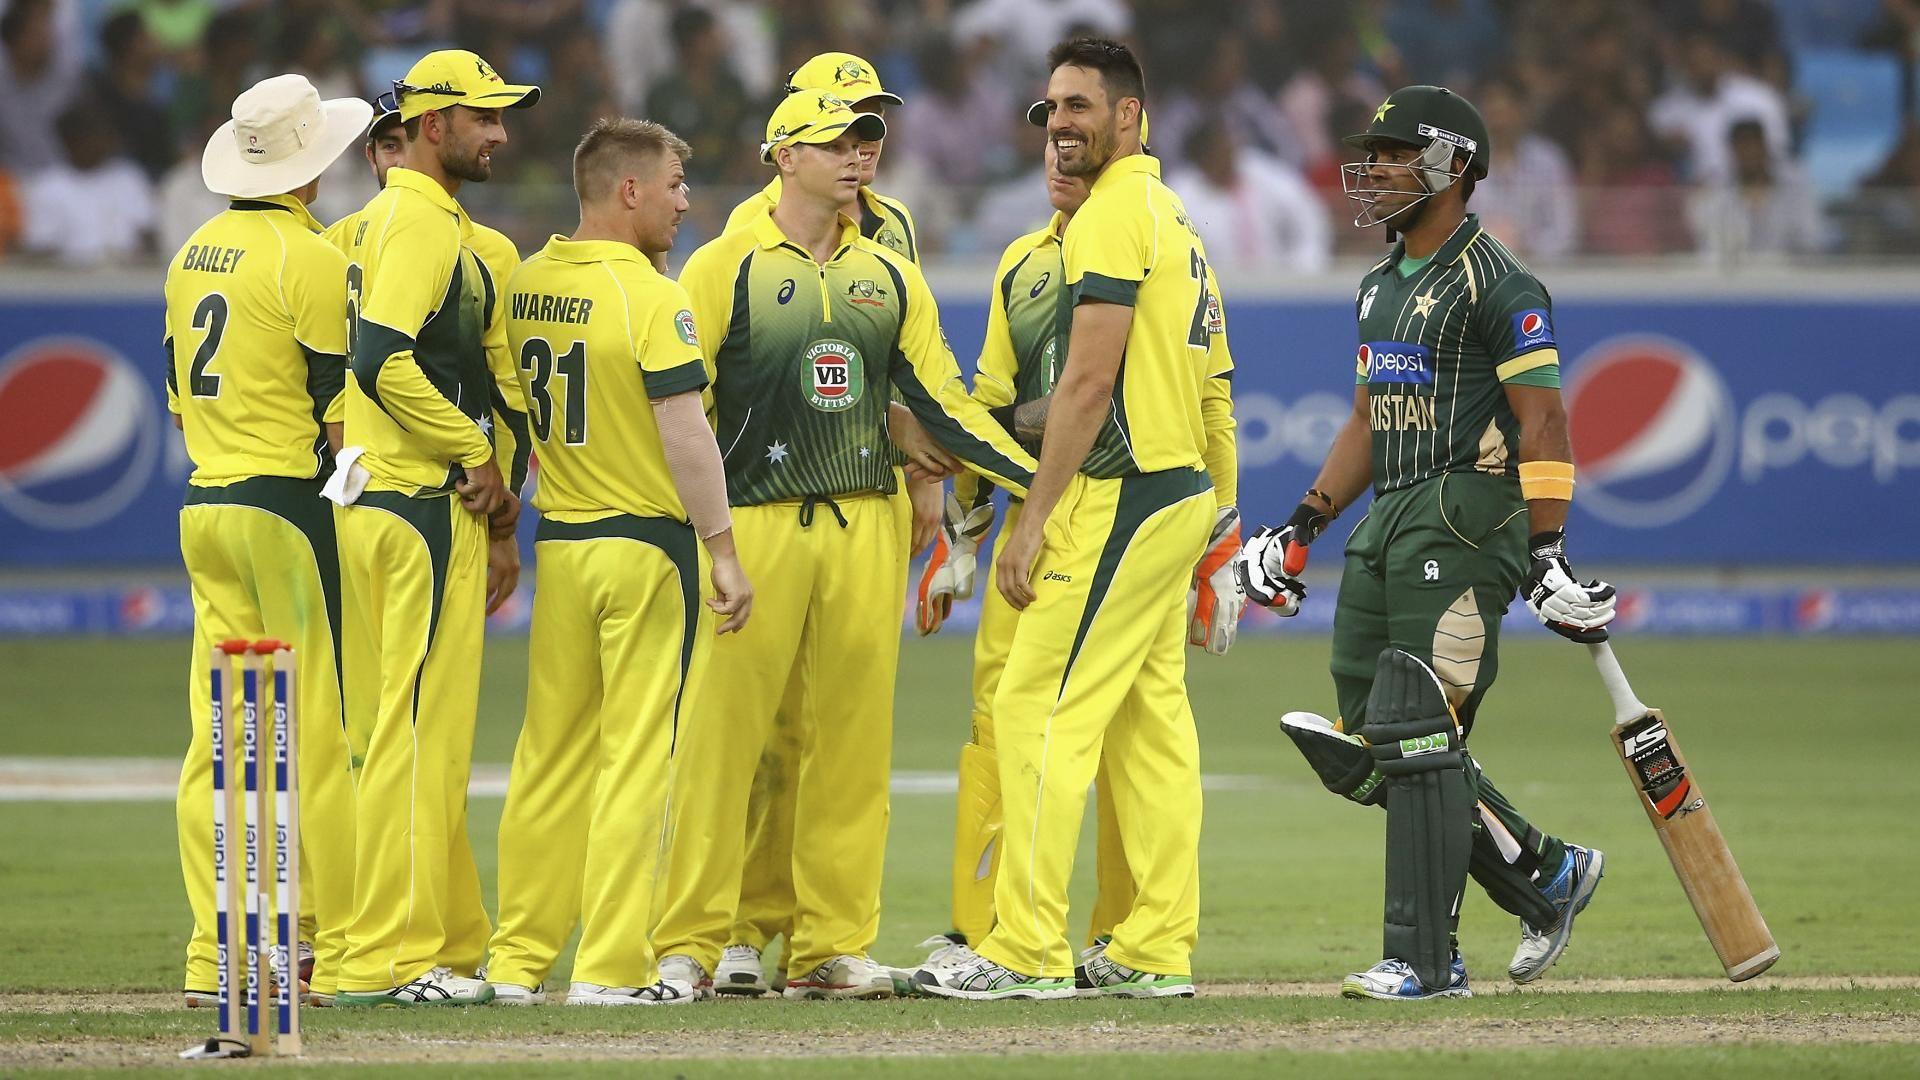 analysis of downfall of pakistan cricket Highlights of pakistan vs new zealand 5th odi match fall of wickets full match analysis pakistan vs new zealand 5th odi 2018 new zealand vs pakistan 2018 cricket series | 5 odi and 3 t20i schedule.